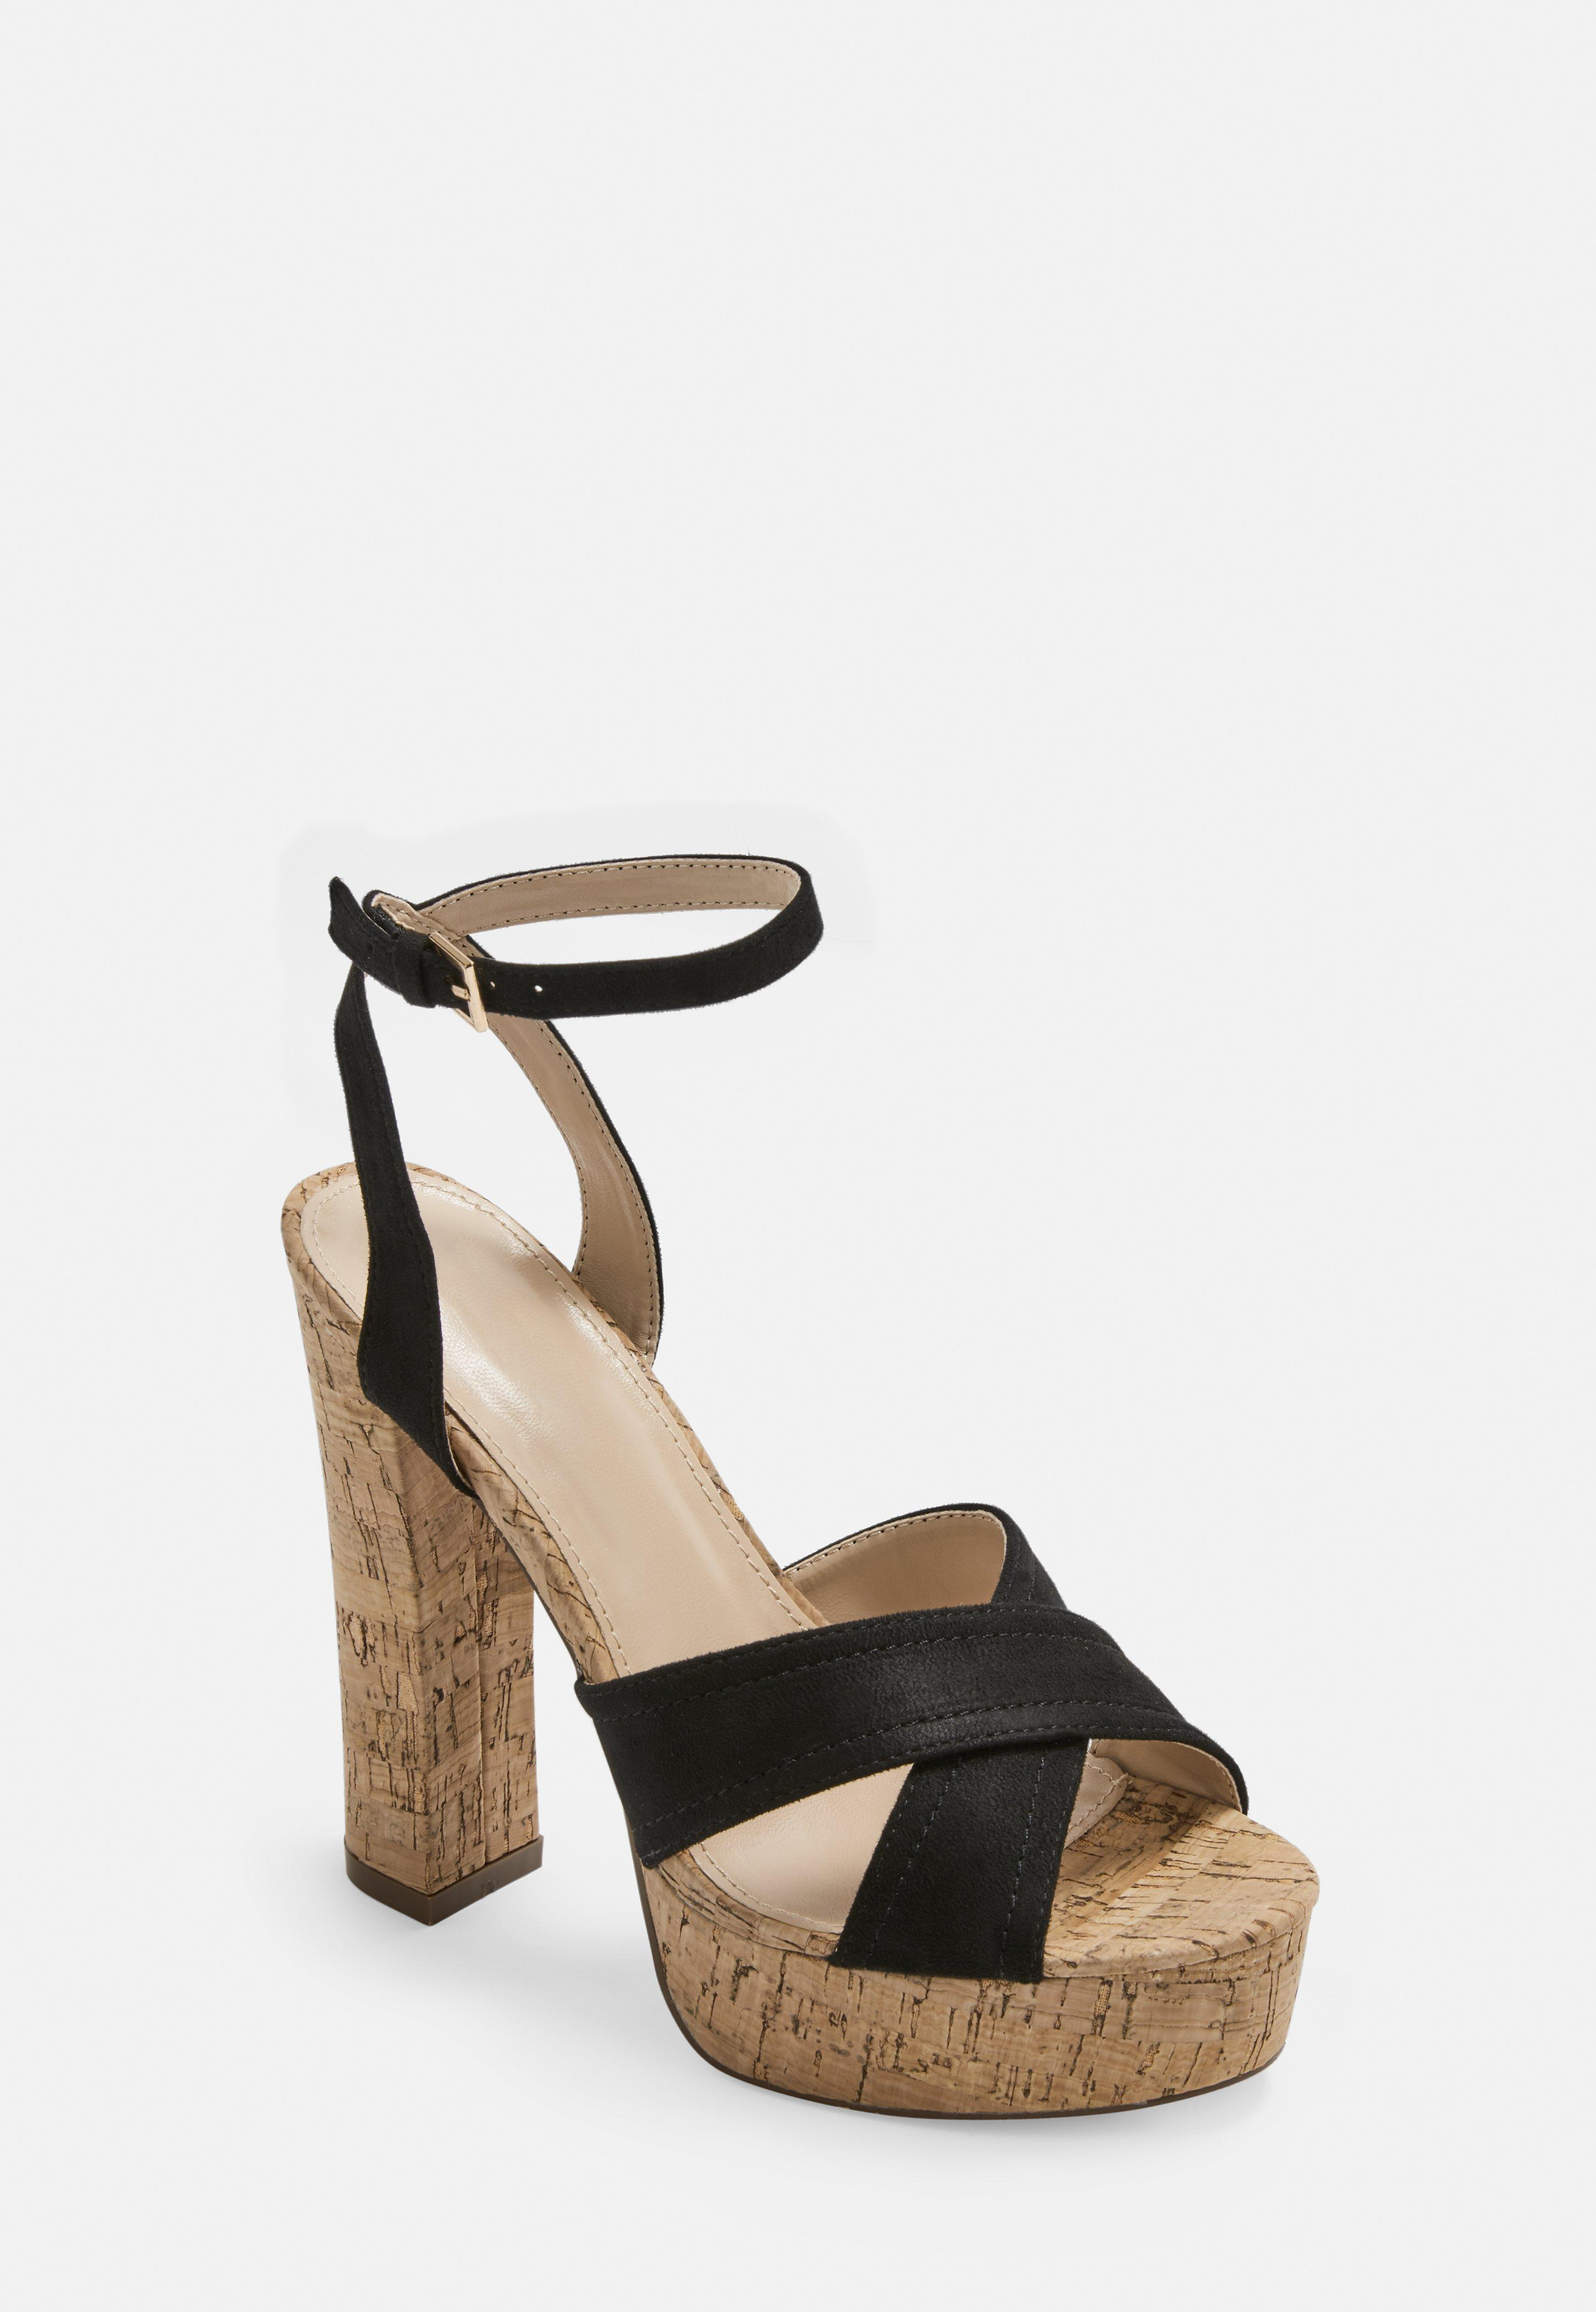 Black Heeled Cross Sandals Over Platform 4Rj53SLcAq